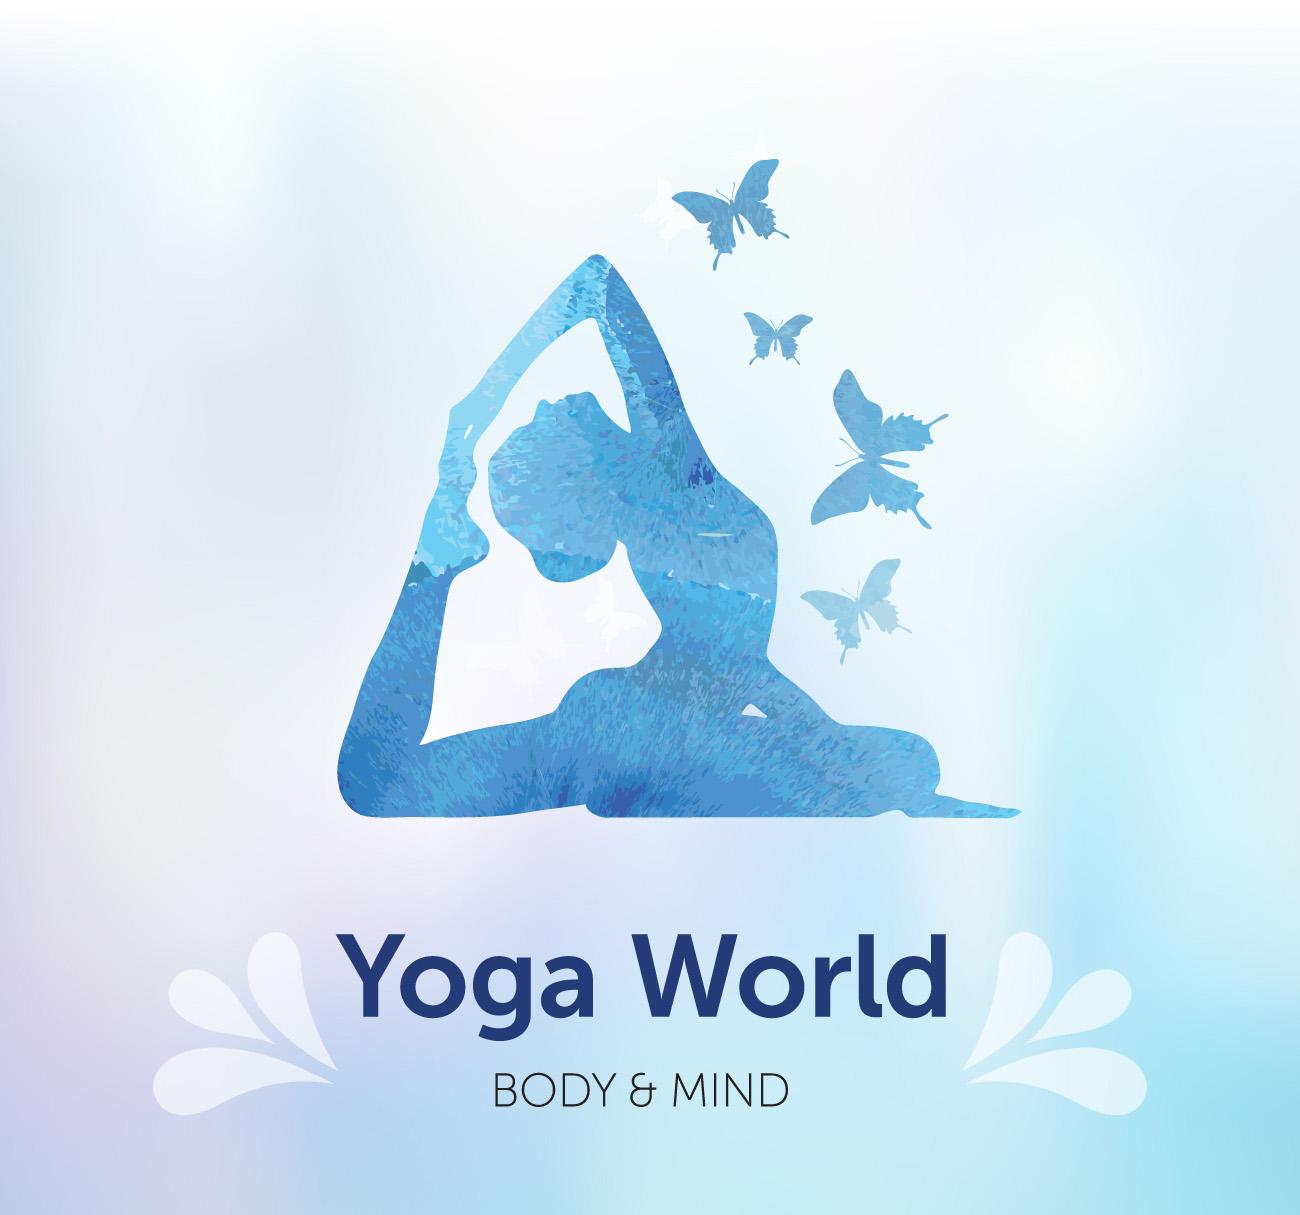 Strange yoga. Такая странная йога